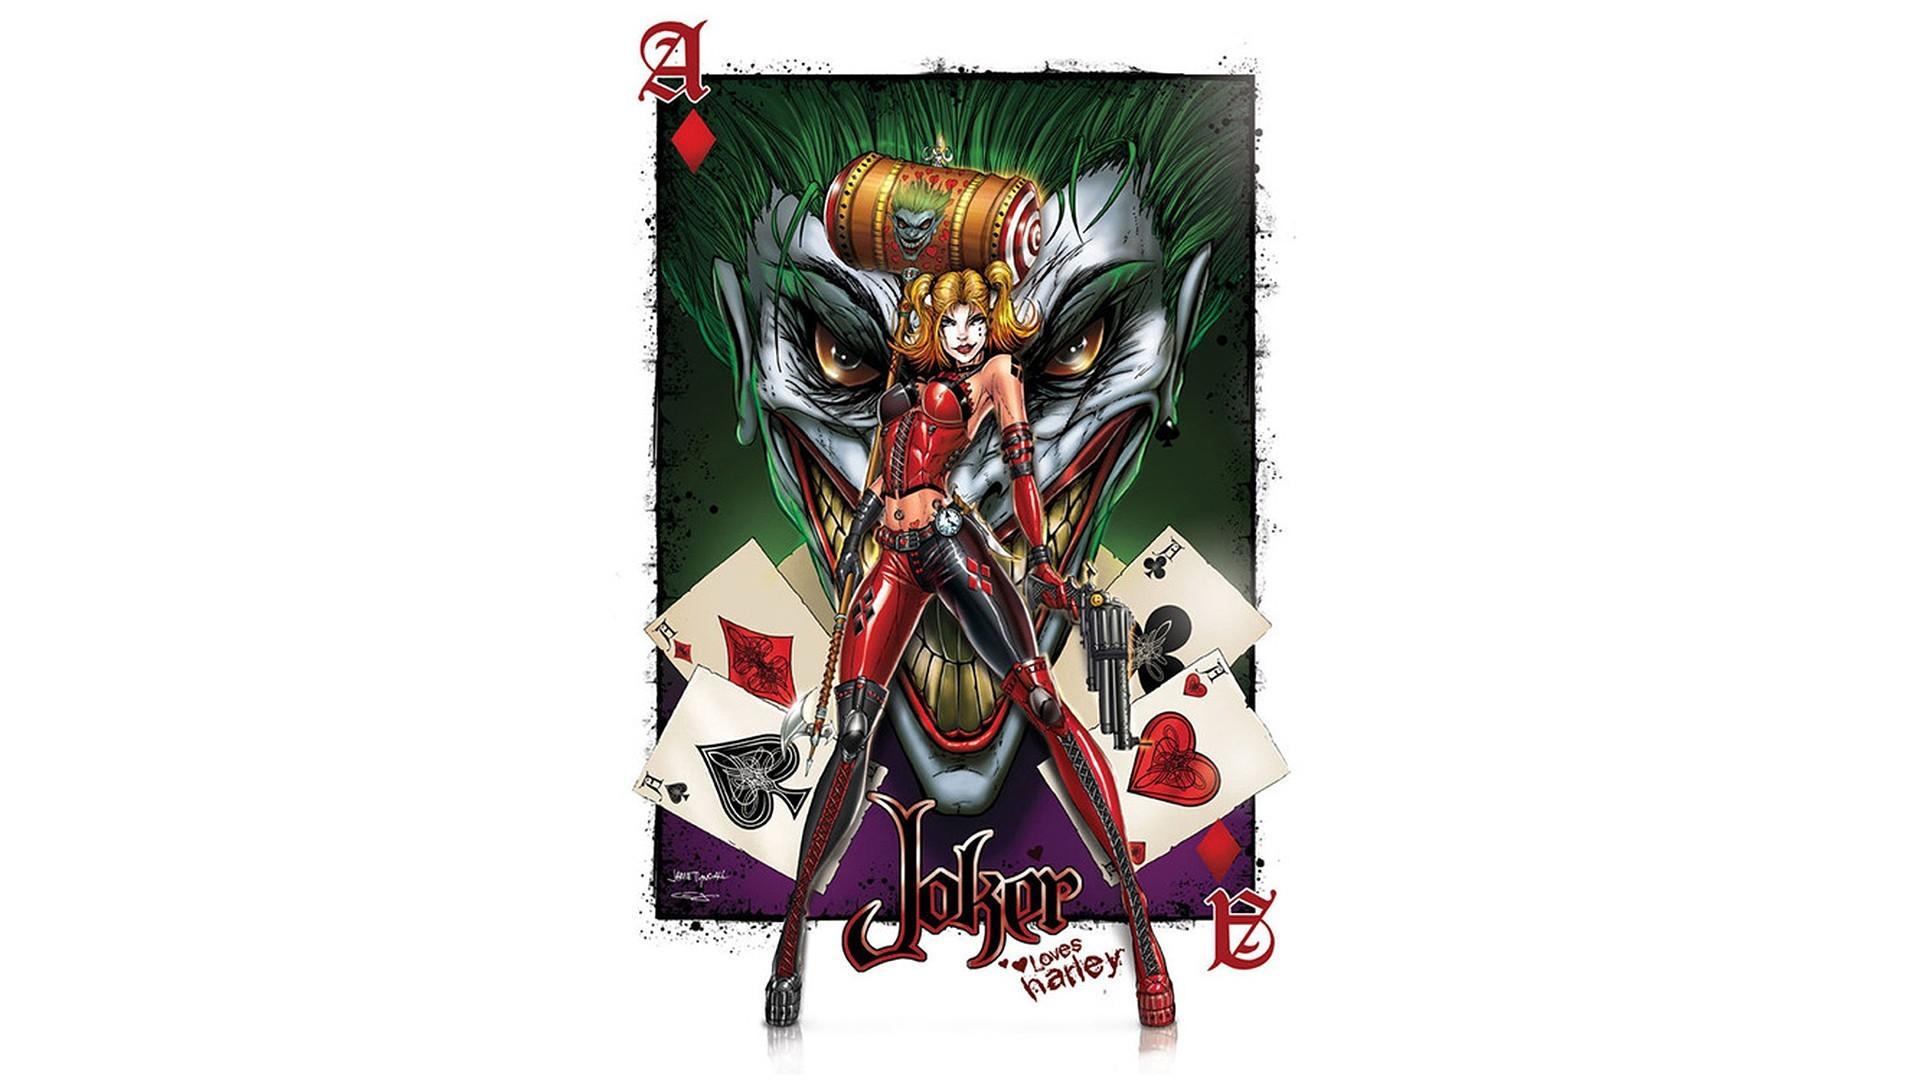 Harley Quinn And Joker Wallpaper ·① Download Free